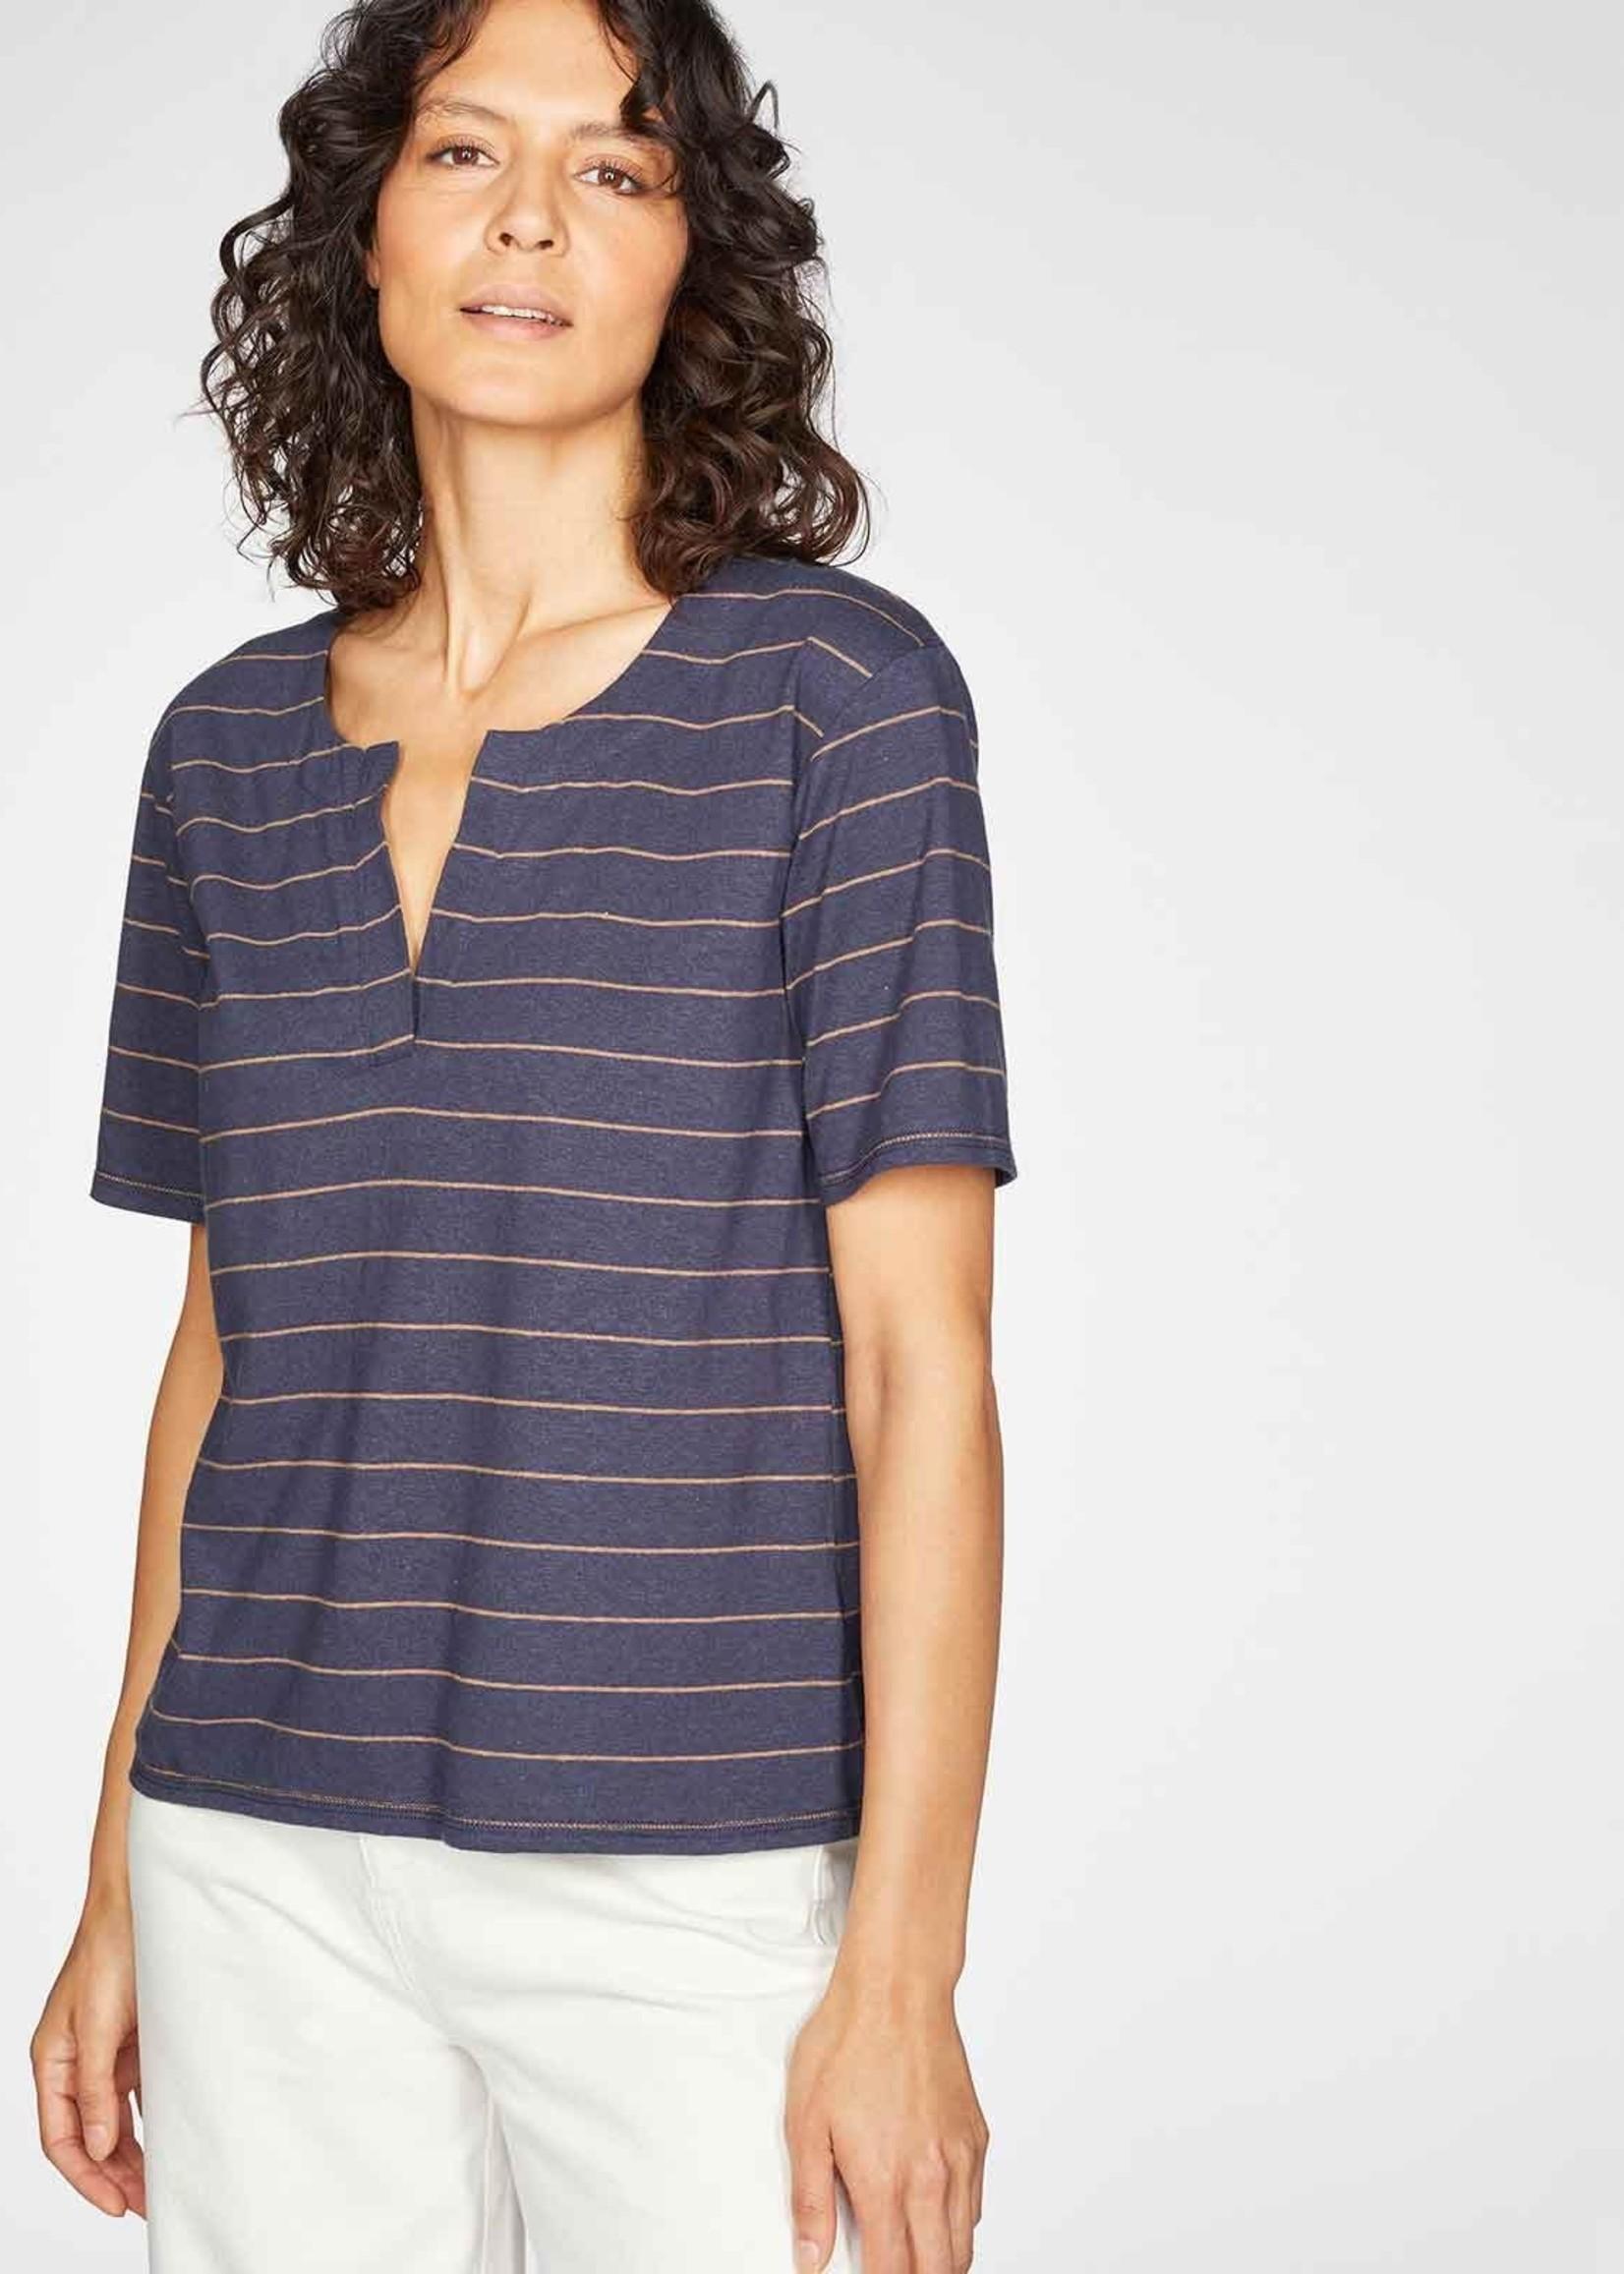 Thought Cecilia Hemp Organic Cotton Striped Jersey